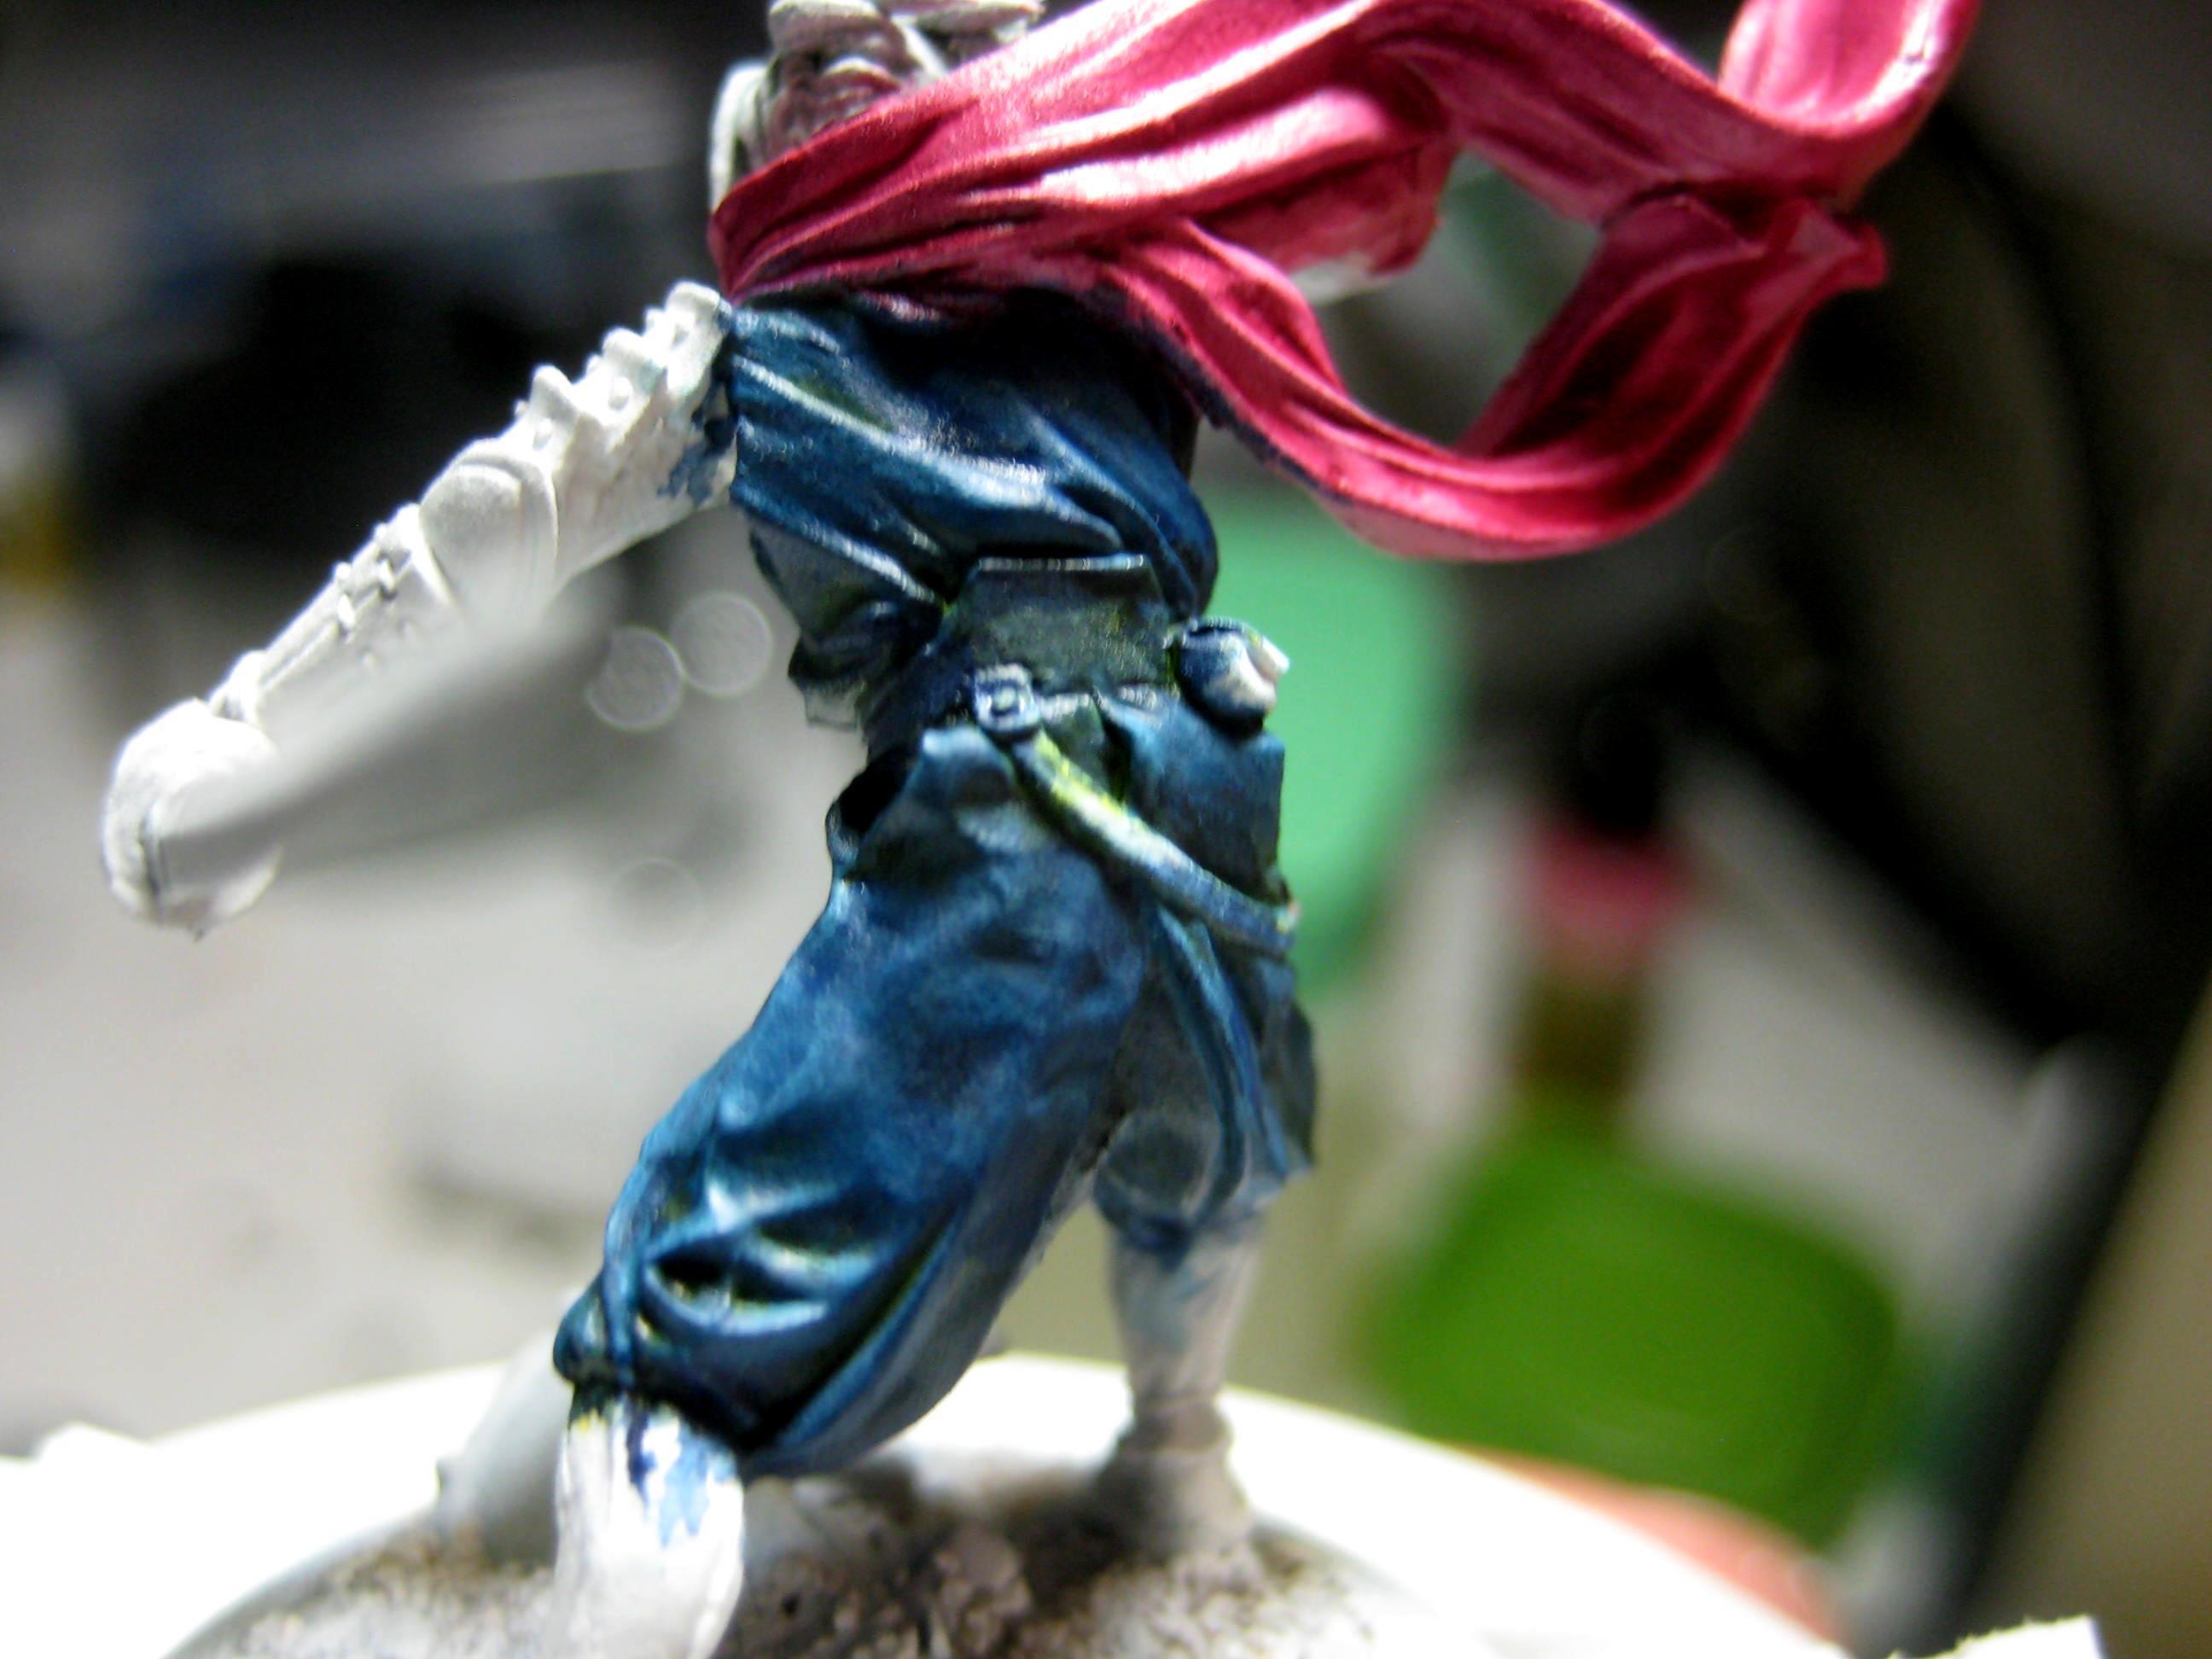 Anima Tactics, Conversion, Greenstuff, Ninjas, Shinobi, Strider, Work In Progress